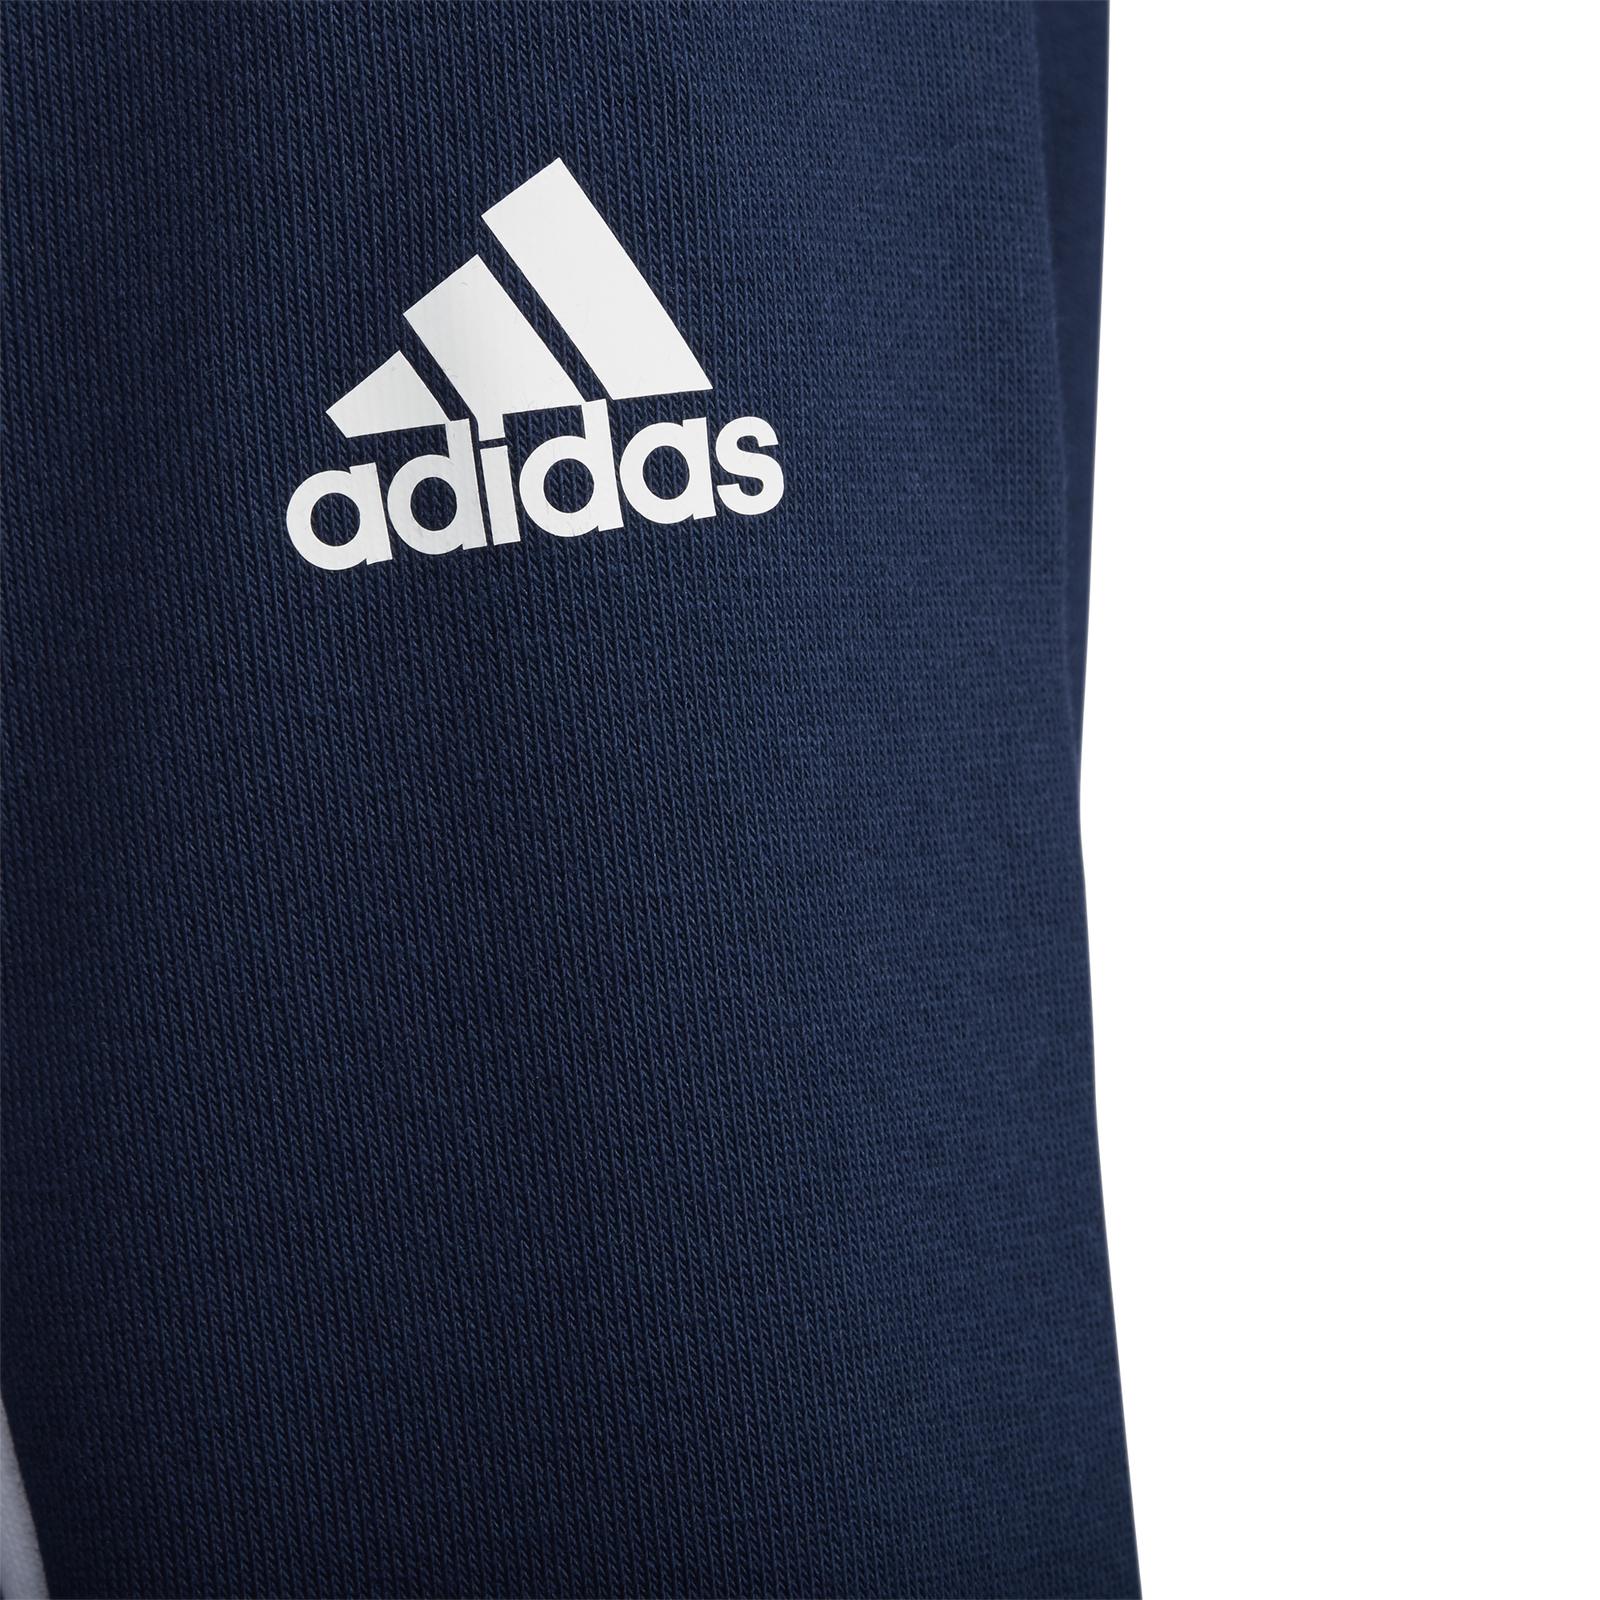 adidas Performance Kinder Trainings Sport Jacke Football Track Top navy rot weiß